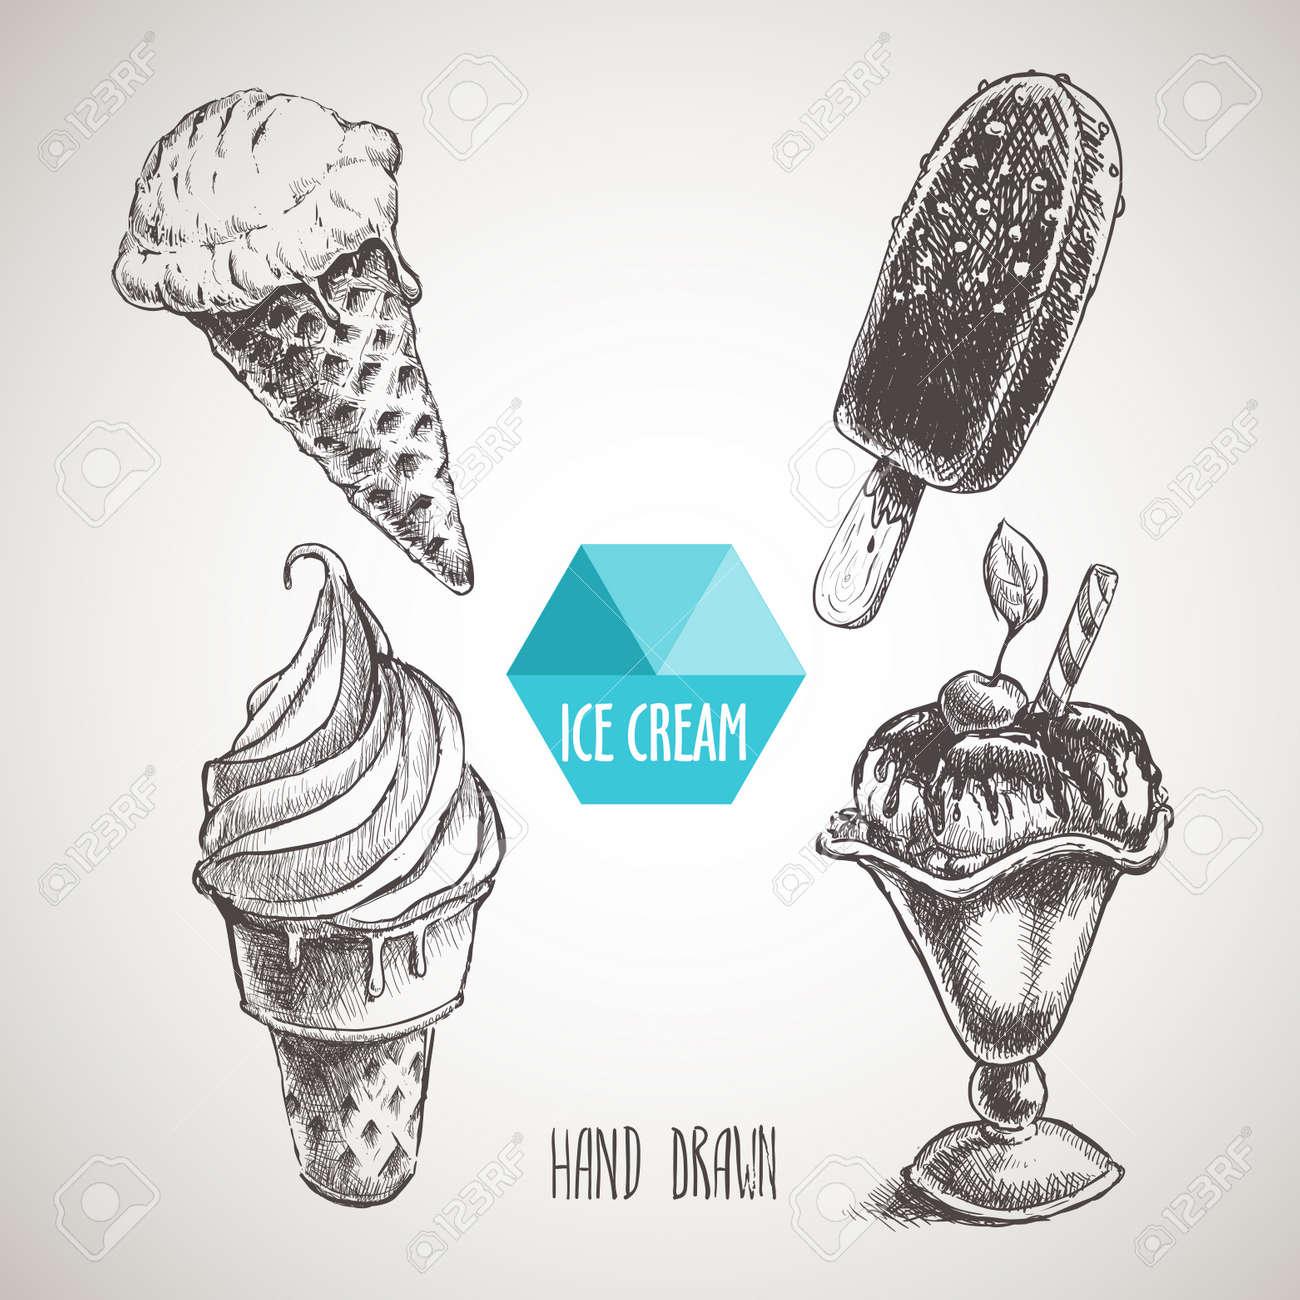 Set of hand drawn sketch style ice cream. Ice cream cone an chokolate ice cream - 58572859